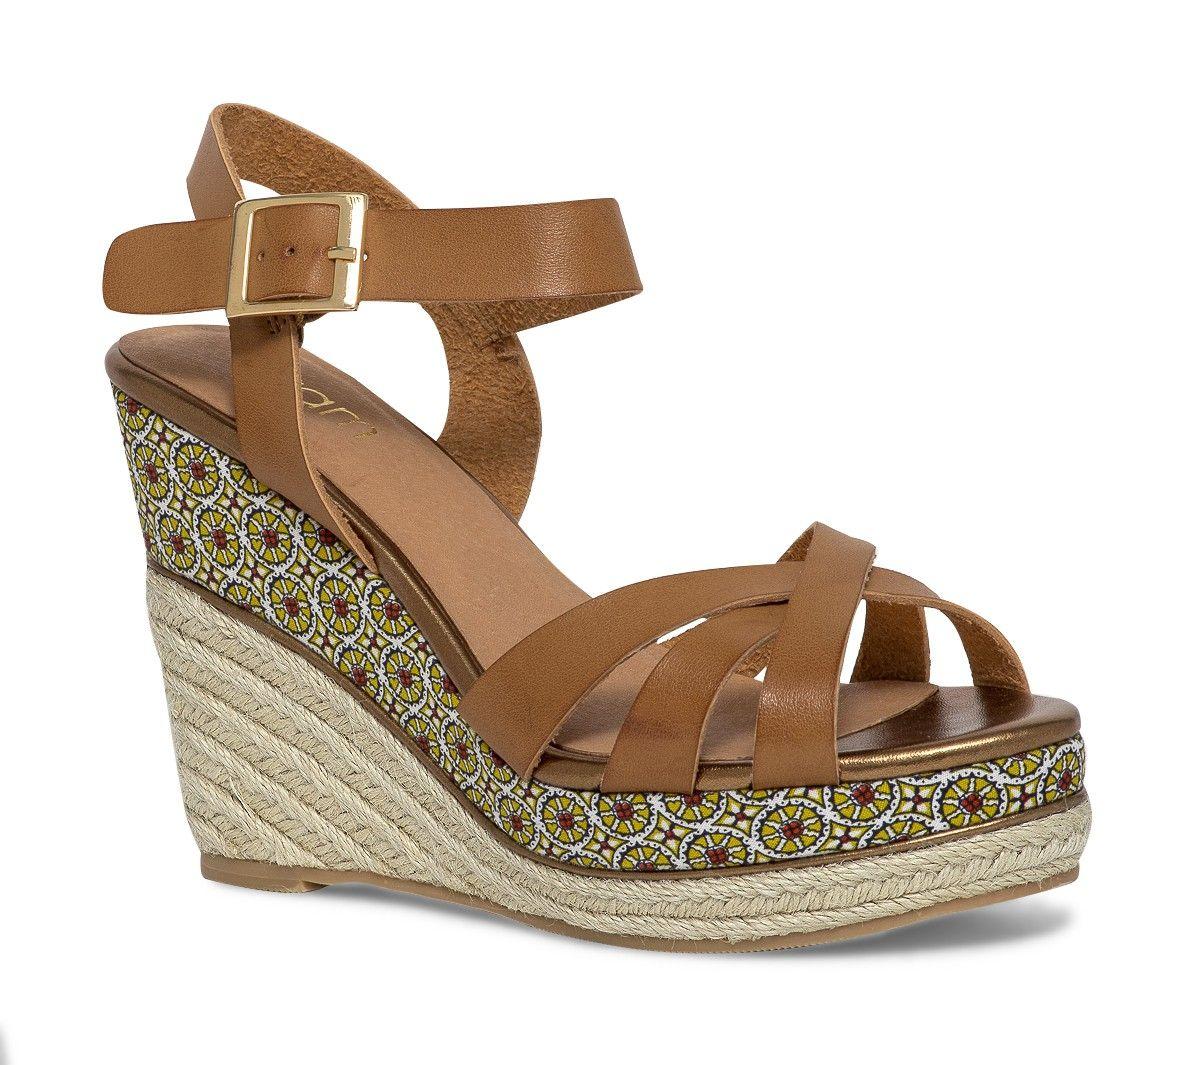 Chaussure a talon compense camel